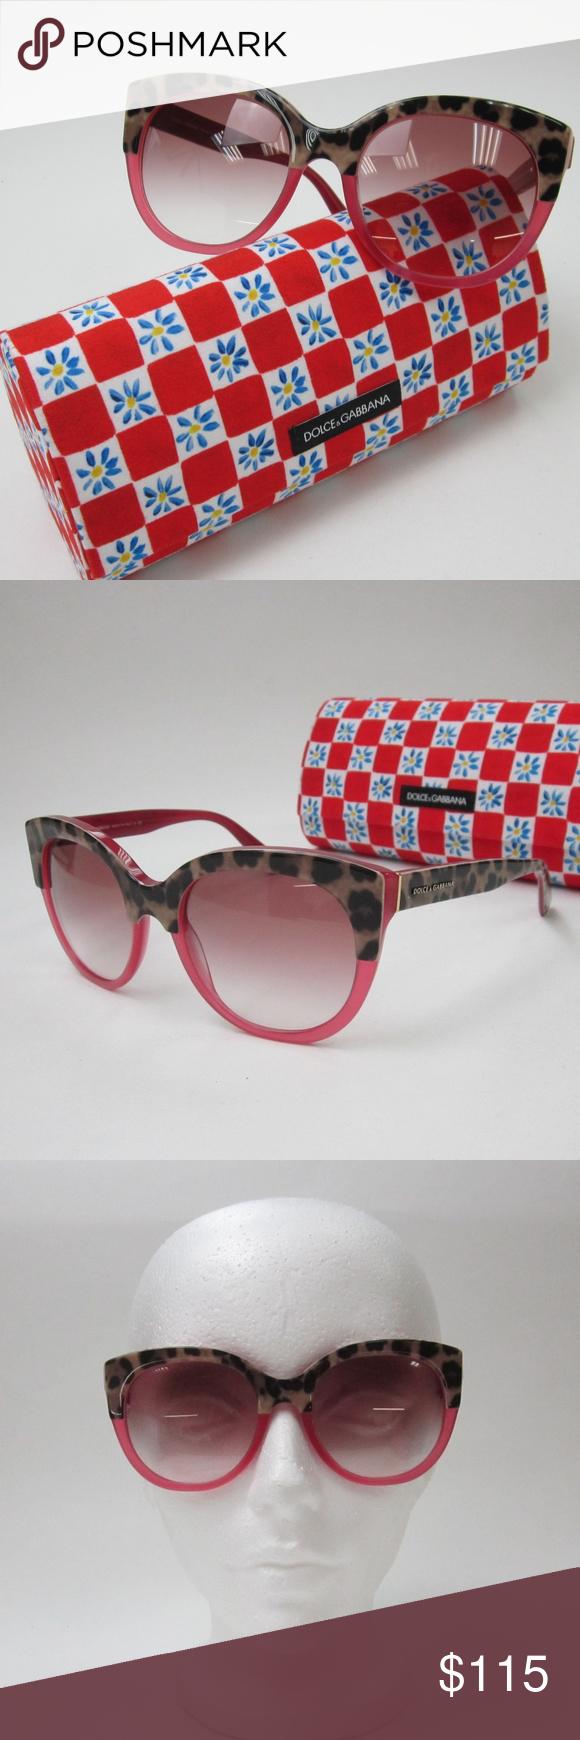 Dolce u gabbana dg womenus sunglassesoln havana lenses